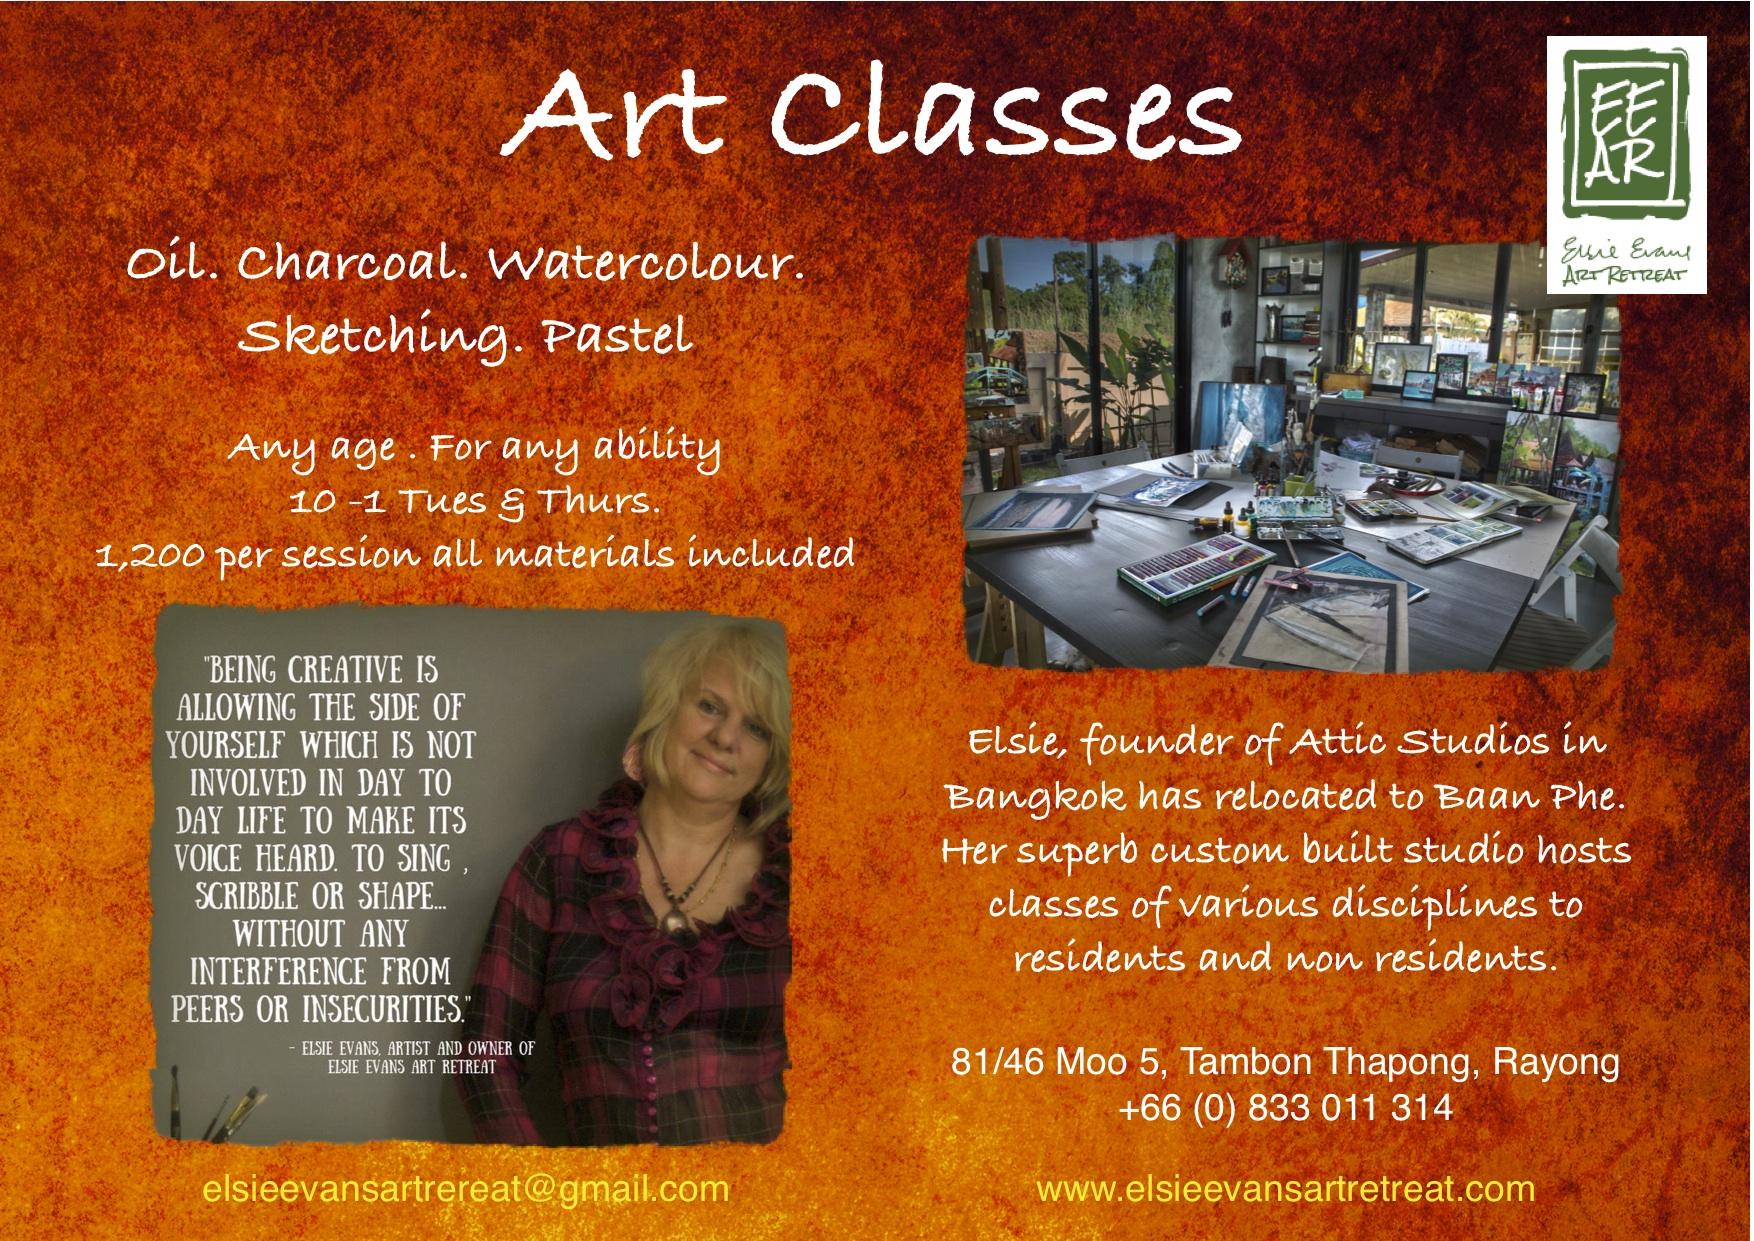 Art classes Jpeg.jpg